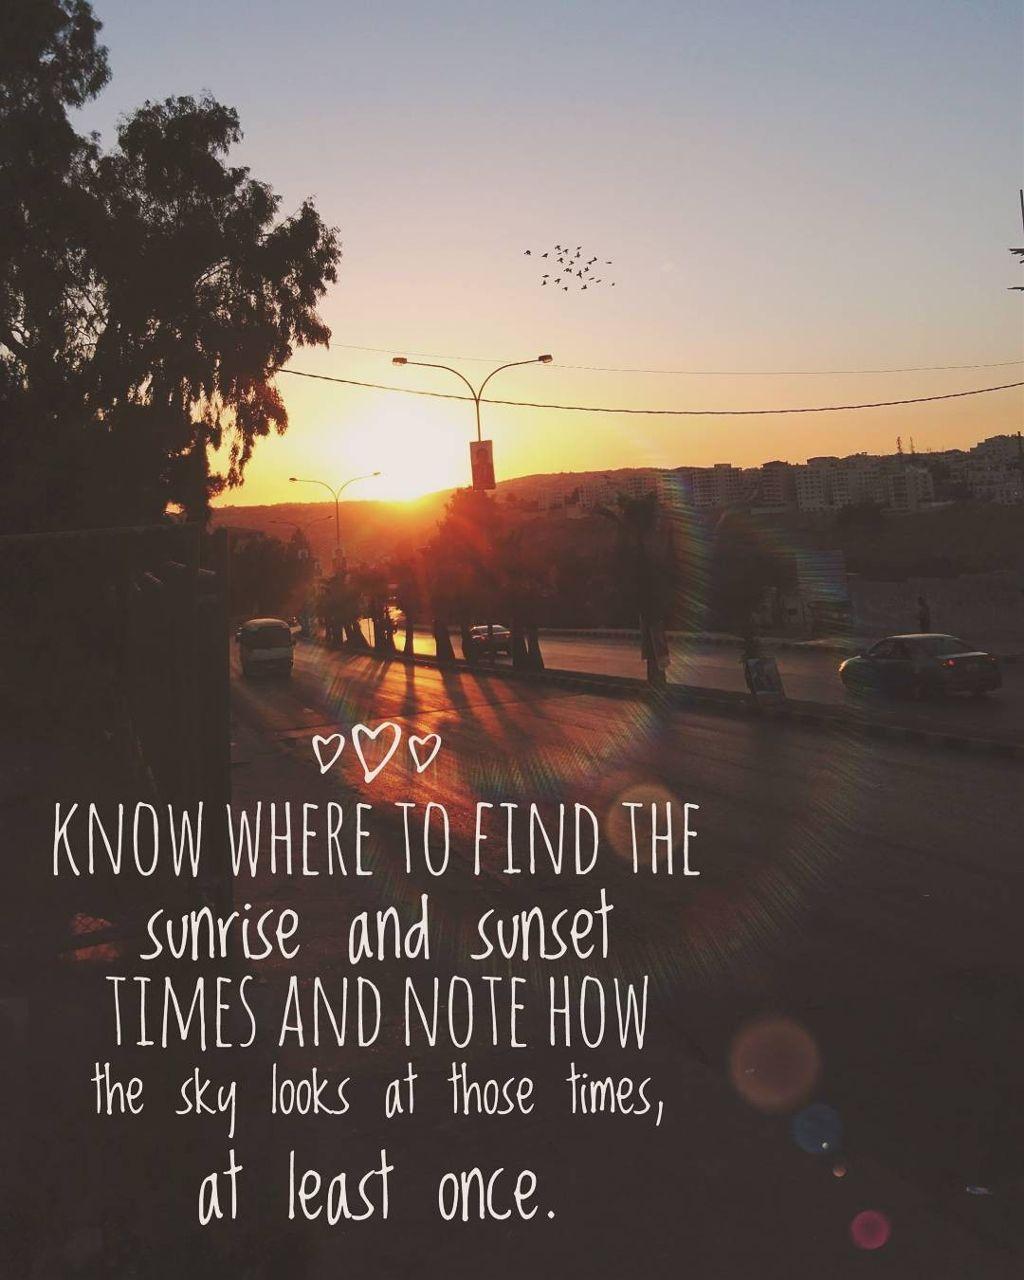 Sunset Quotes The sunset in Amman city Jordan Amman sunset quotes & Sunset Quotes